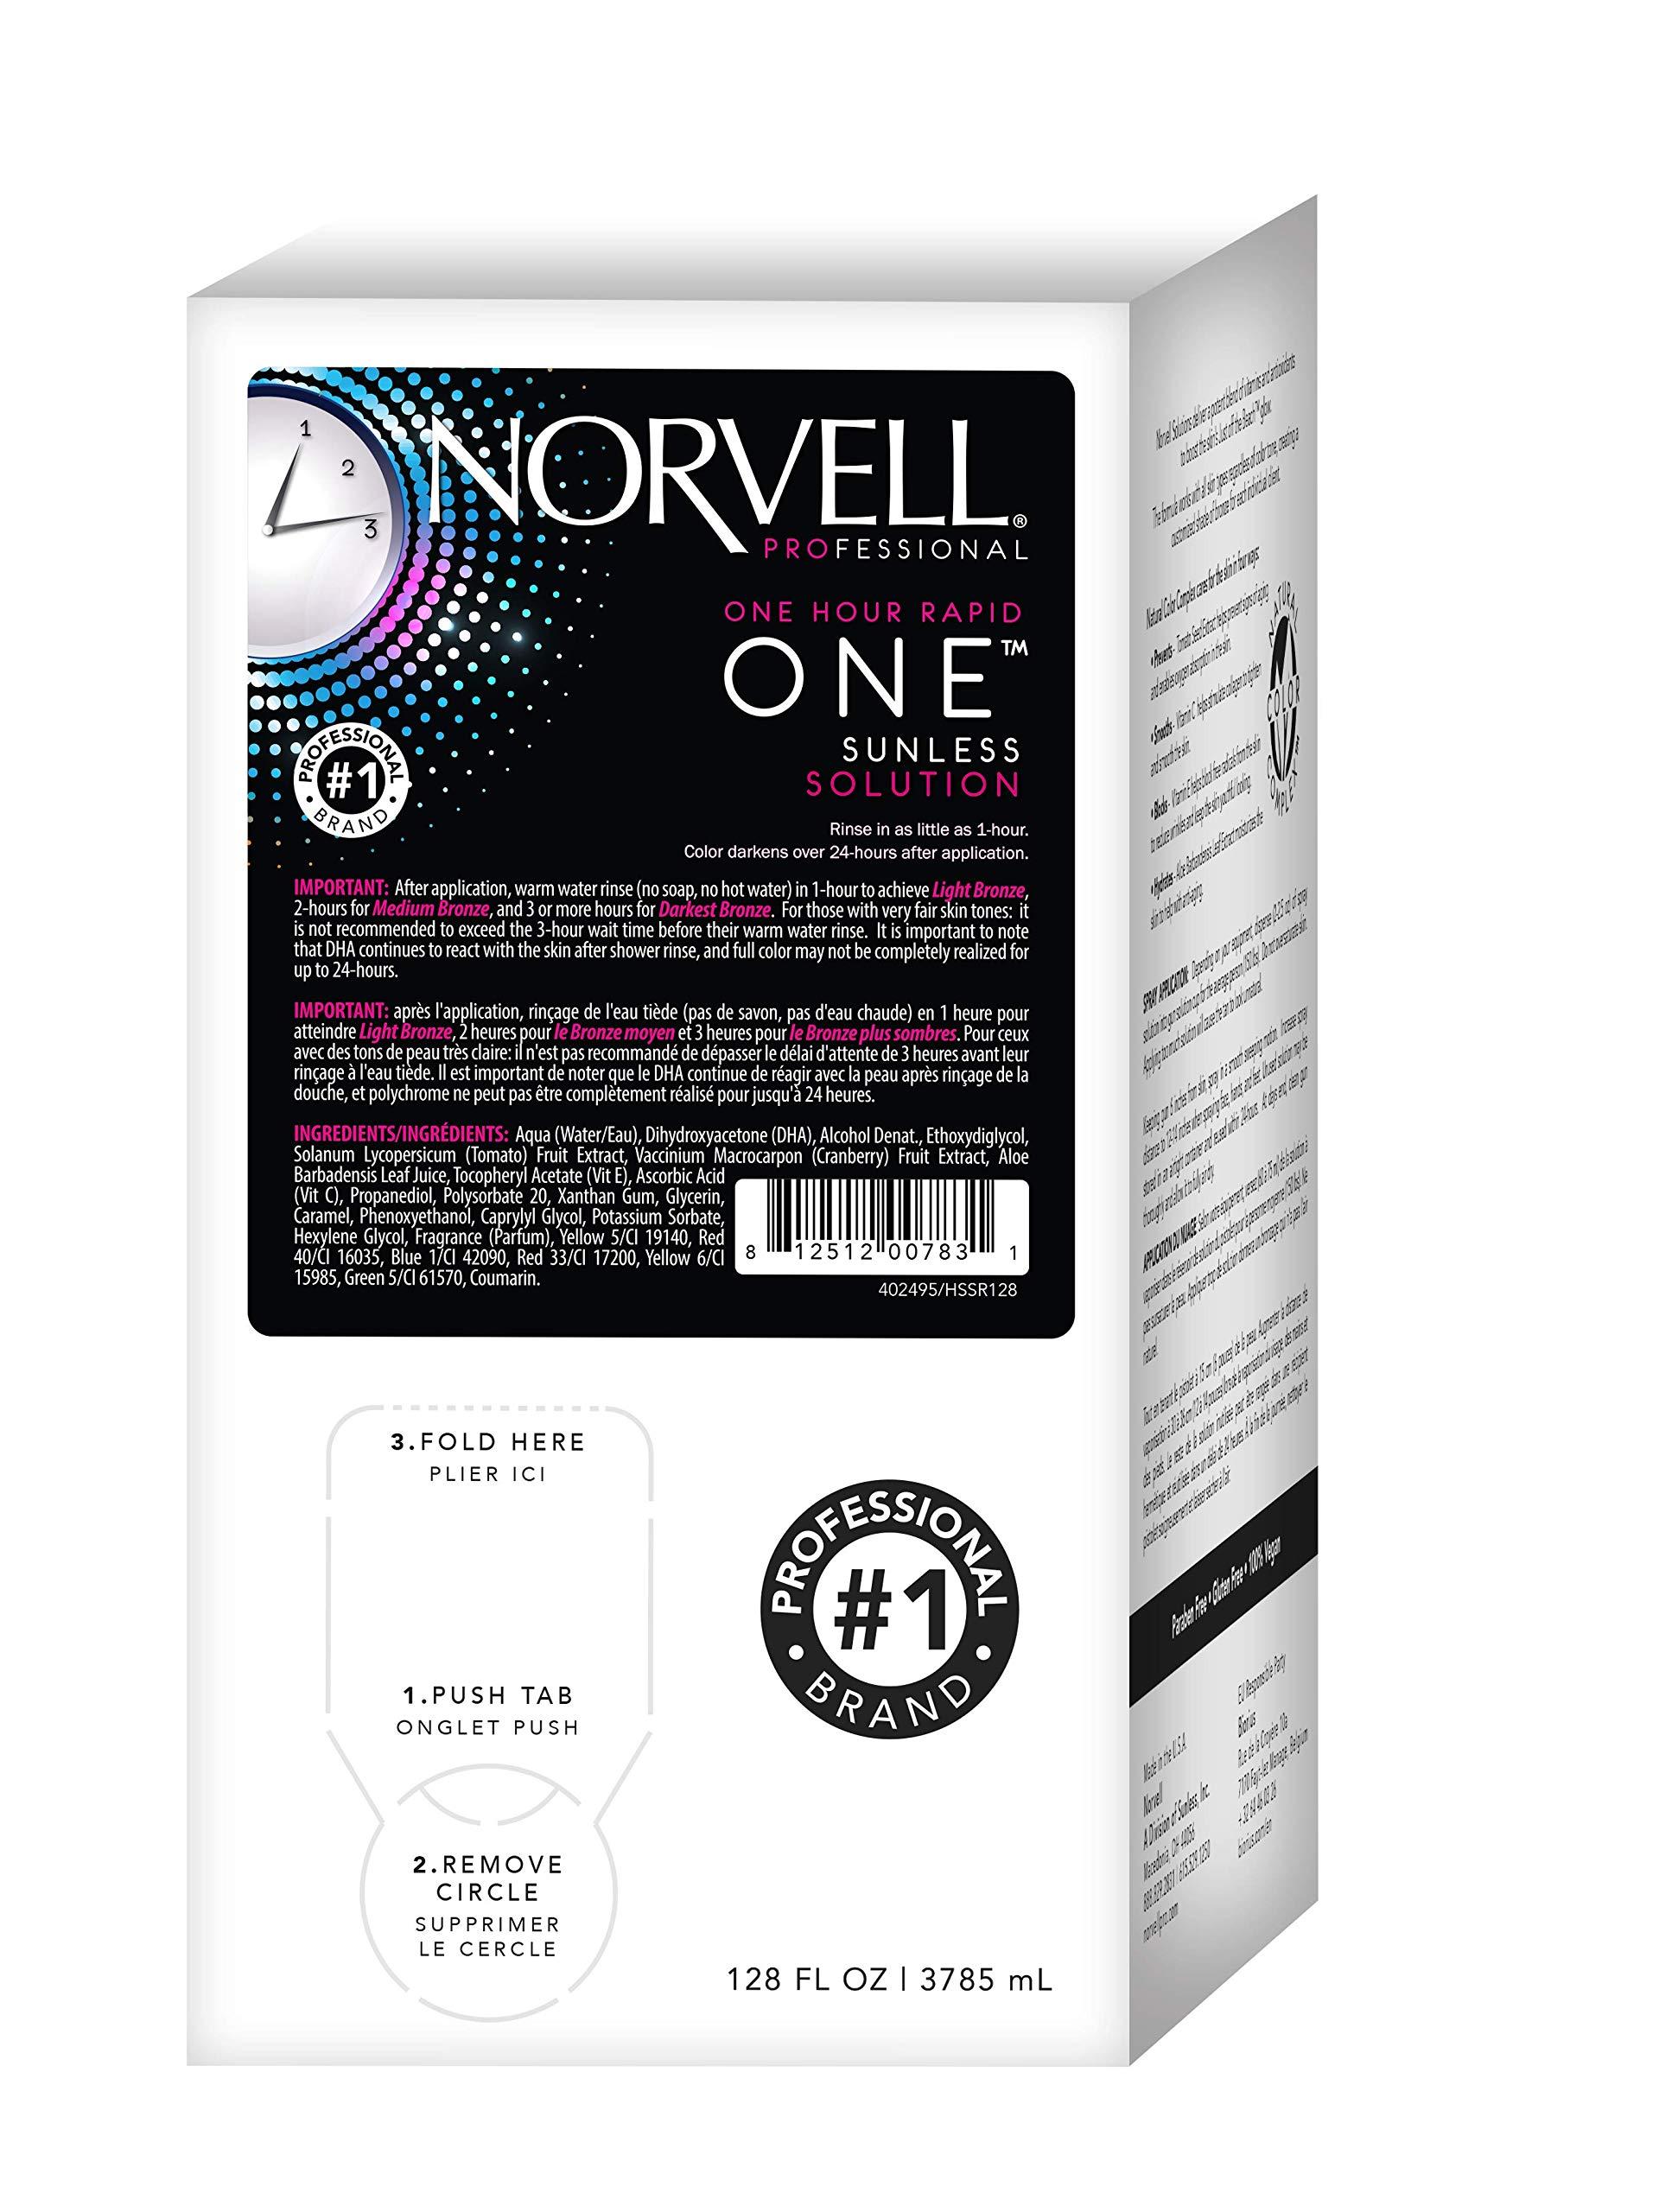 Norvell Premium Sunless Tanning Solution - One Hour Rapid, Gallon/128 fl.oz.